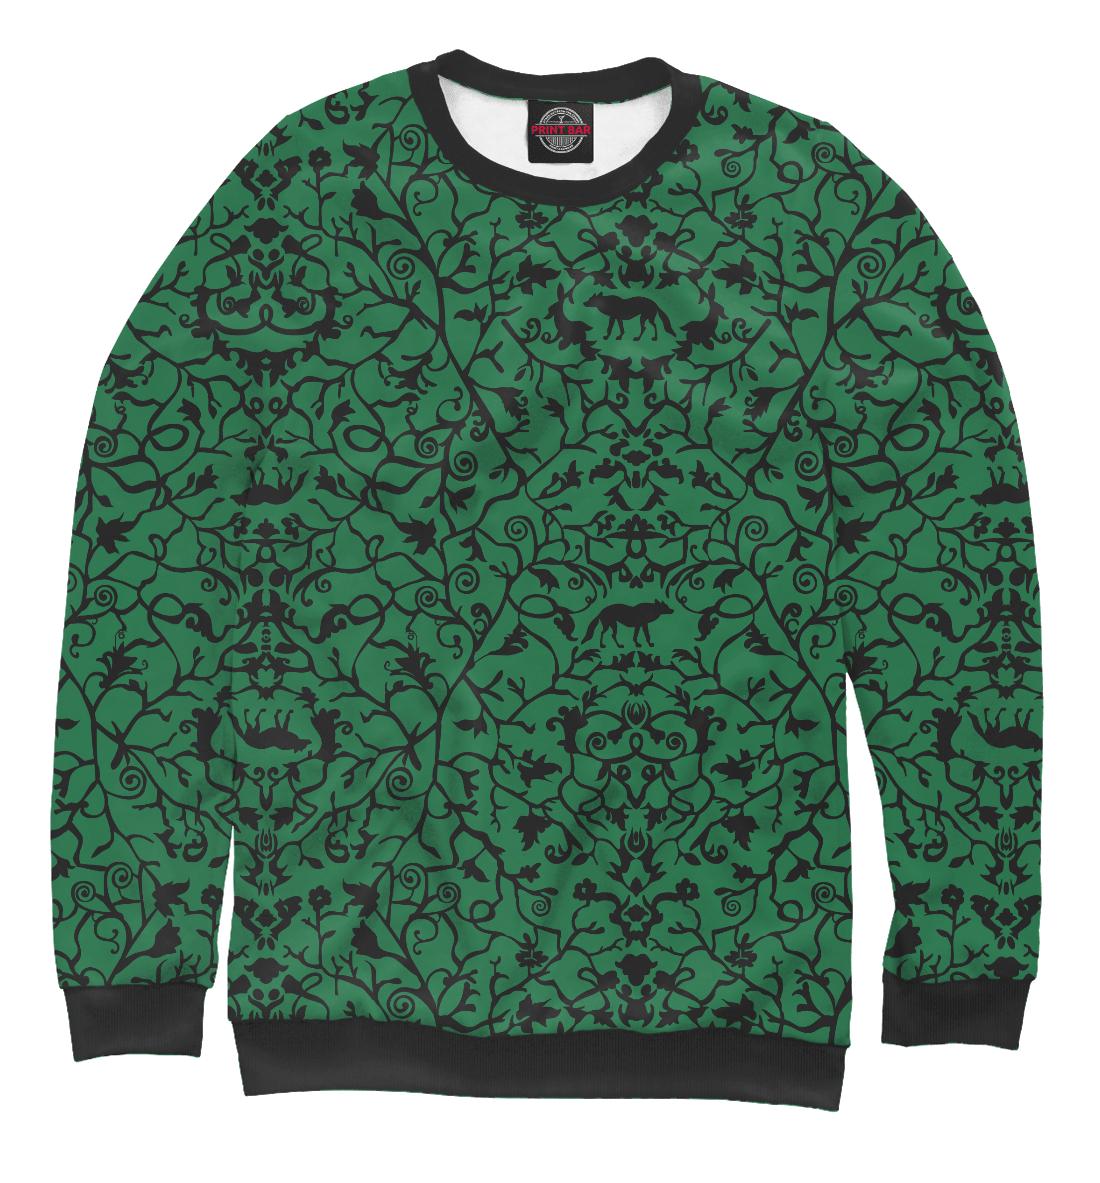 Купить Abstract Wolf Green, Printbar, Свитшоты, ABS-712445-swi-1